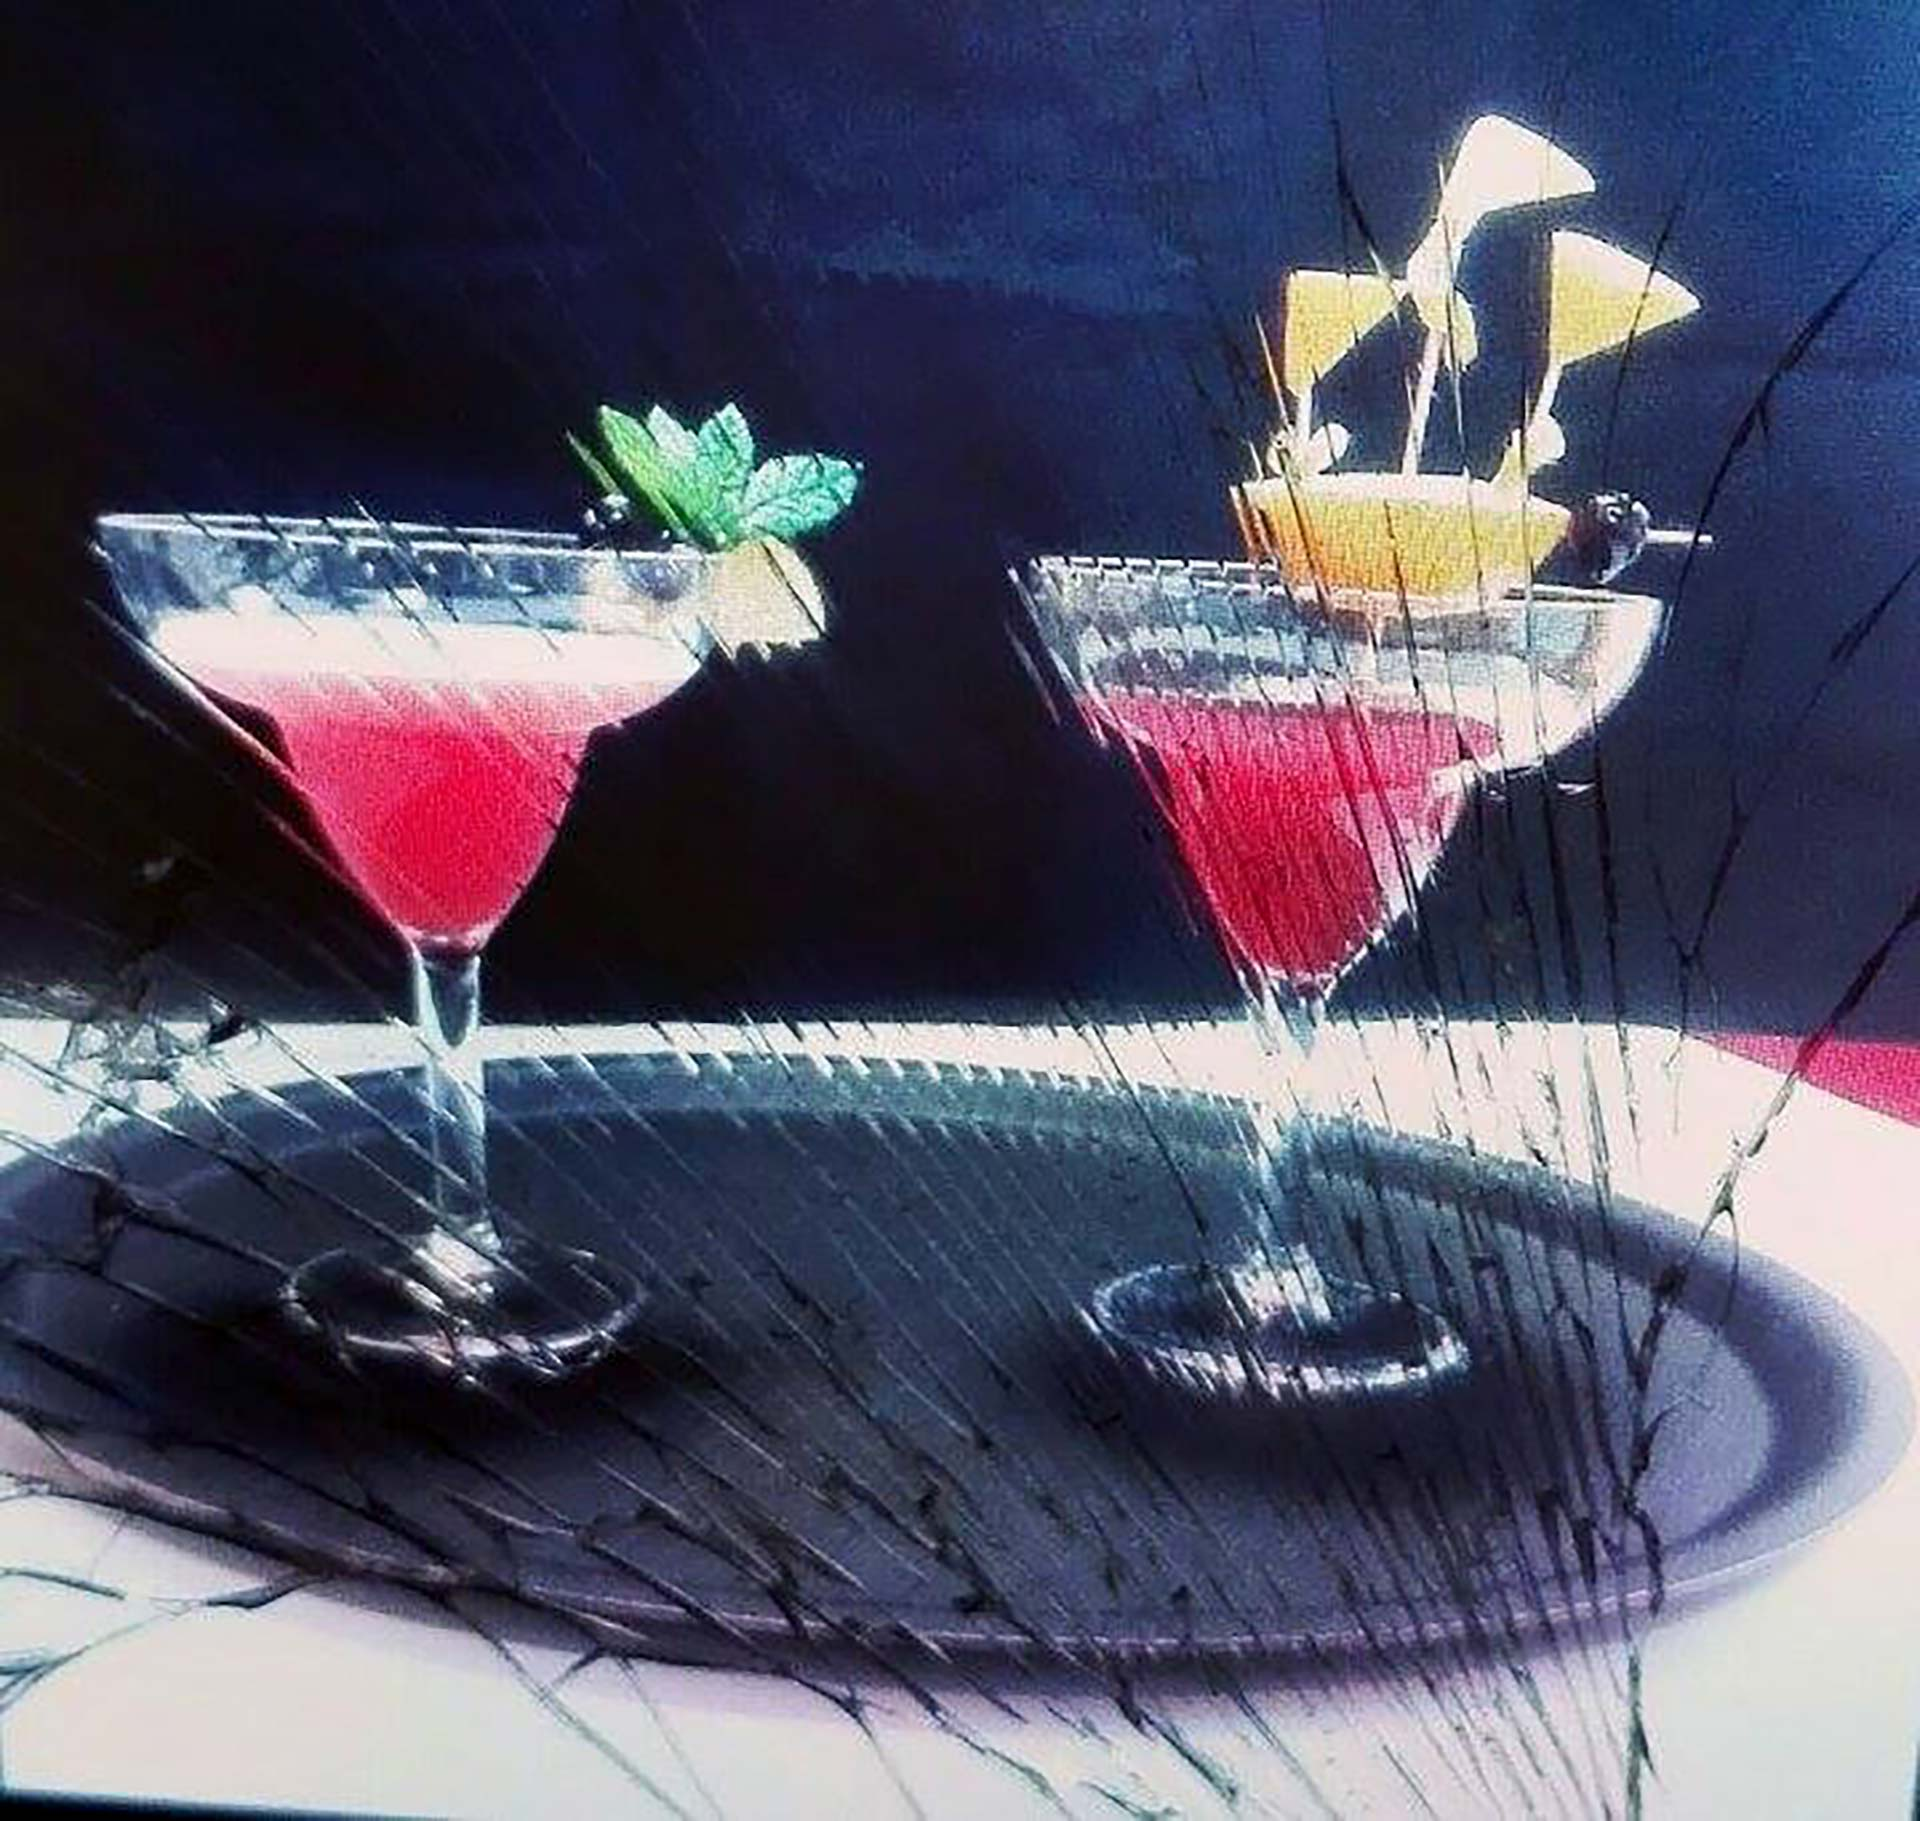 Beverage Cocktails Fruit Punch (Polibibita analcolica) 2016